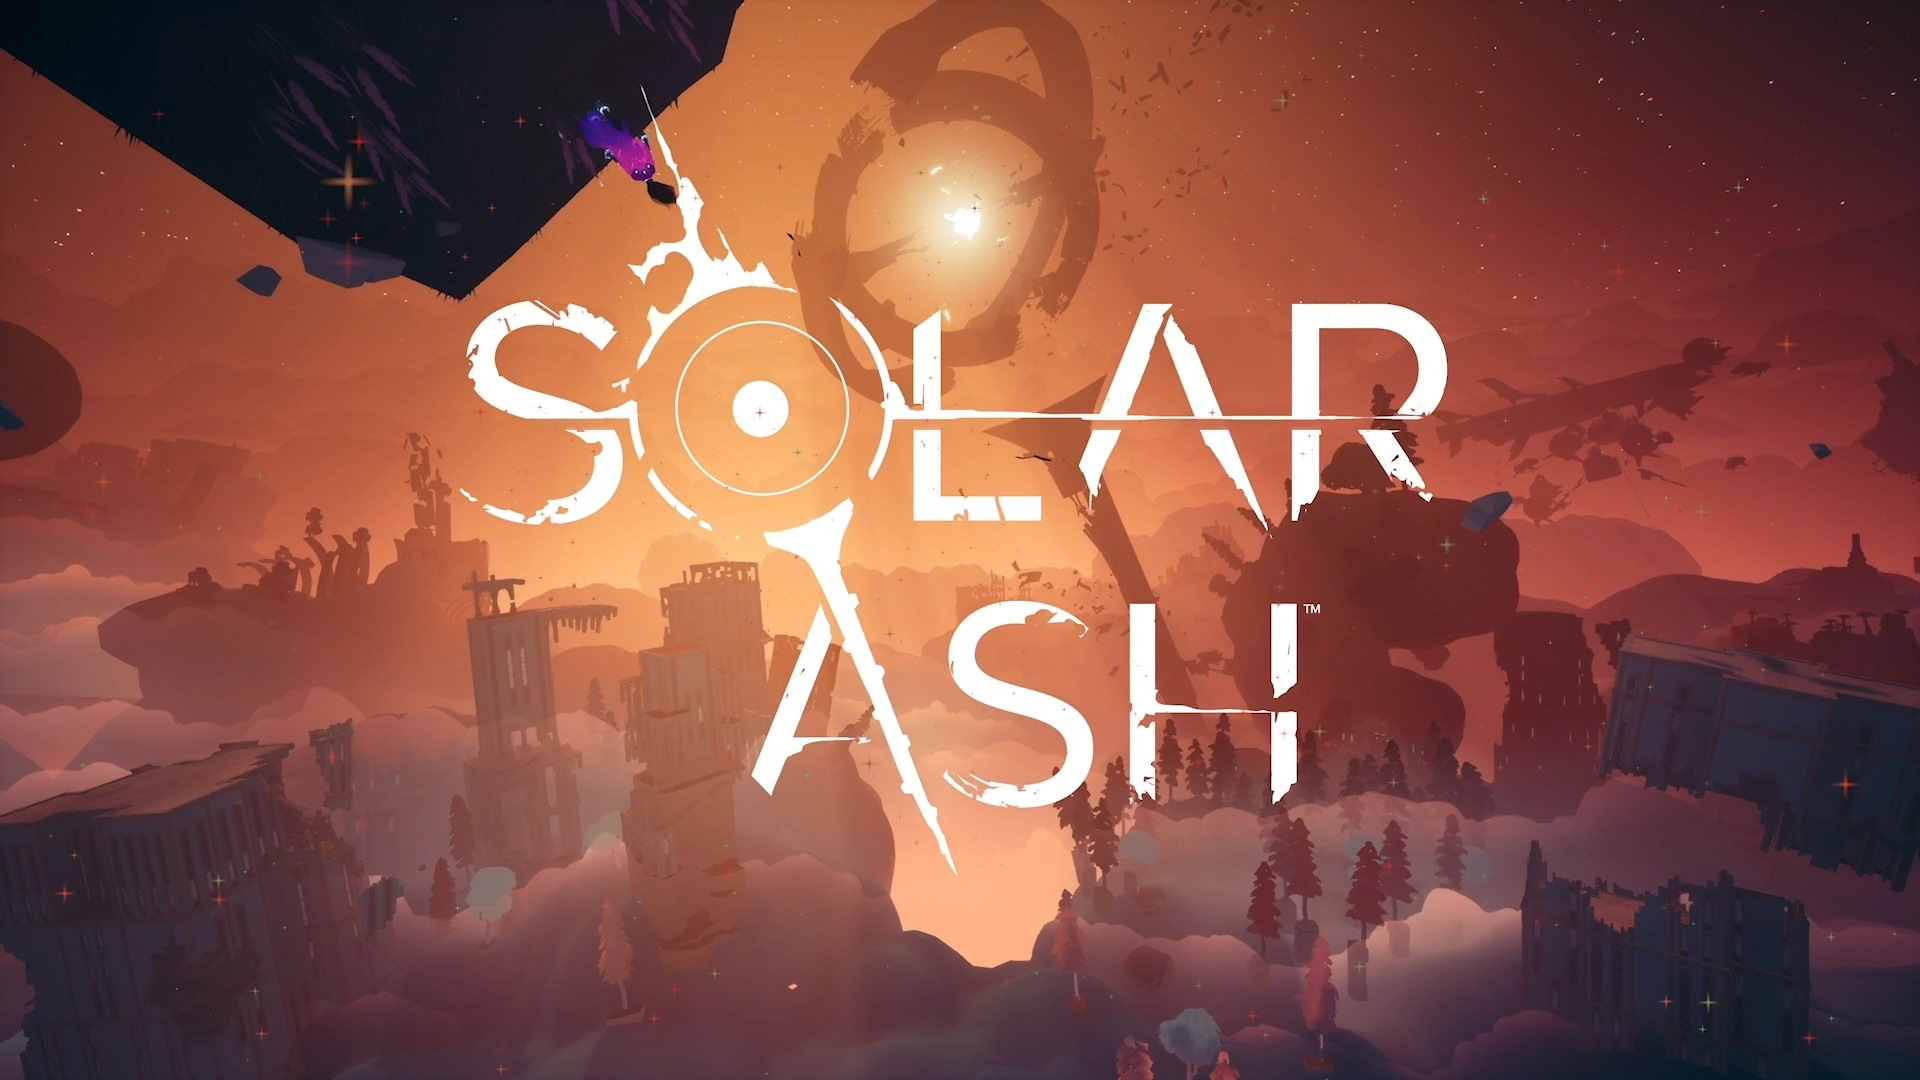 solar ash kingdom game wallpaper 73210